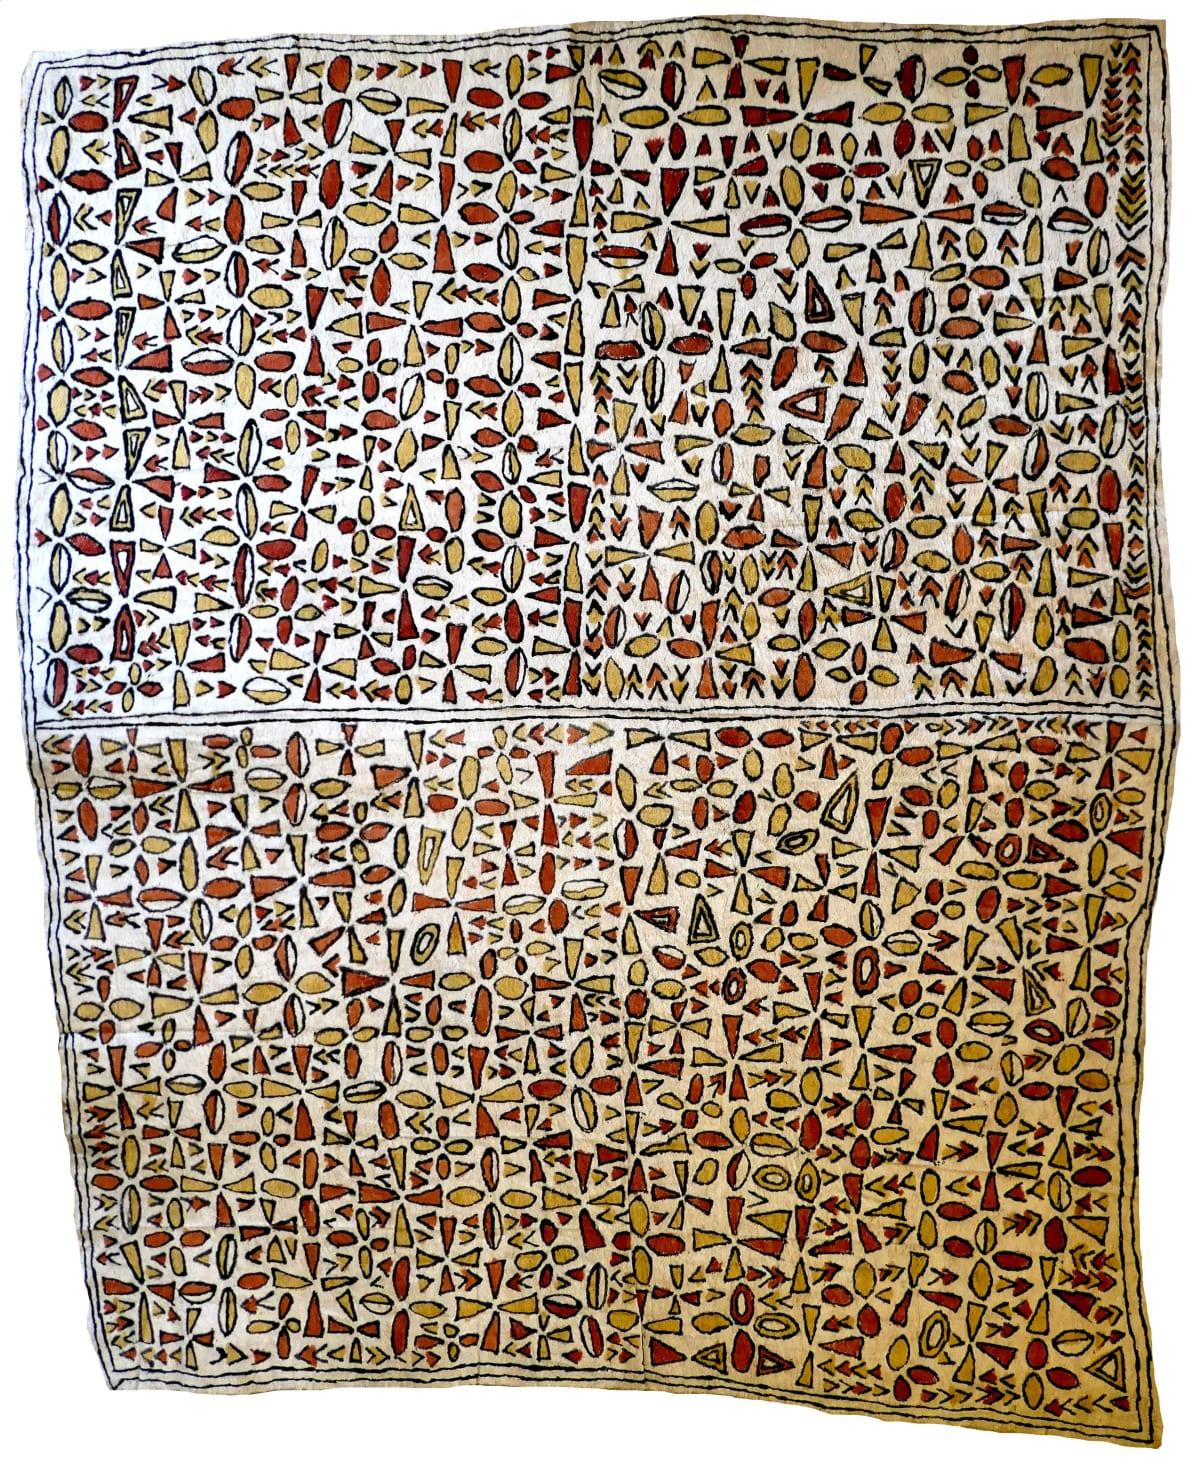 Martha-Jean Uhamo (Dogarine) Soru'e natural pigments on nioge (barkcloth) 103 x 85 cm